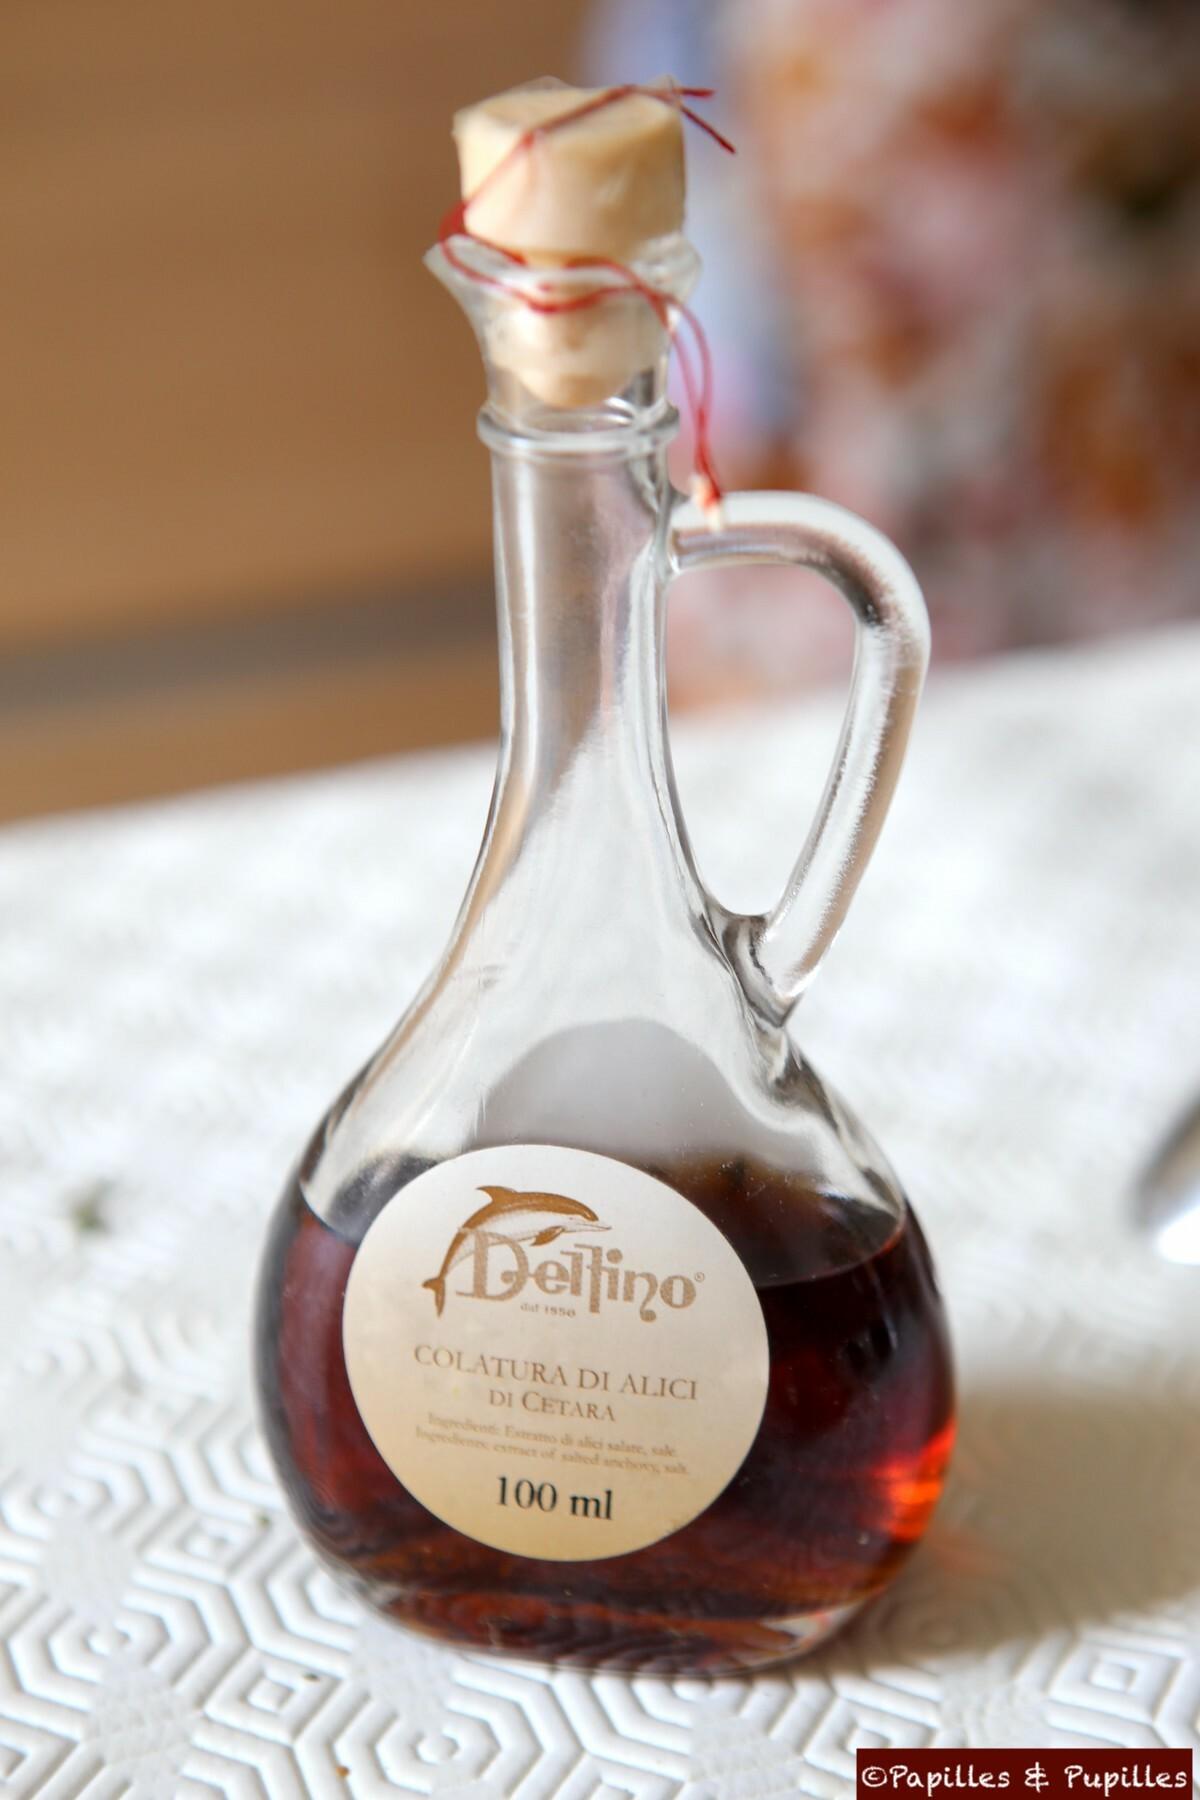 Colatura di alici di Cetara, l'anchois en bouteille